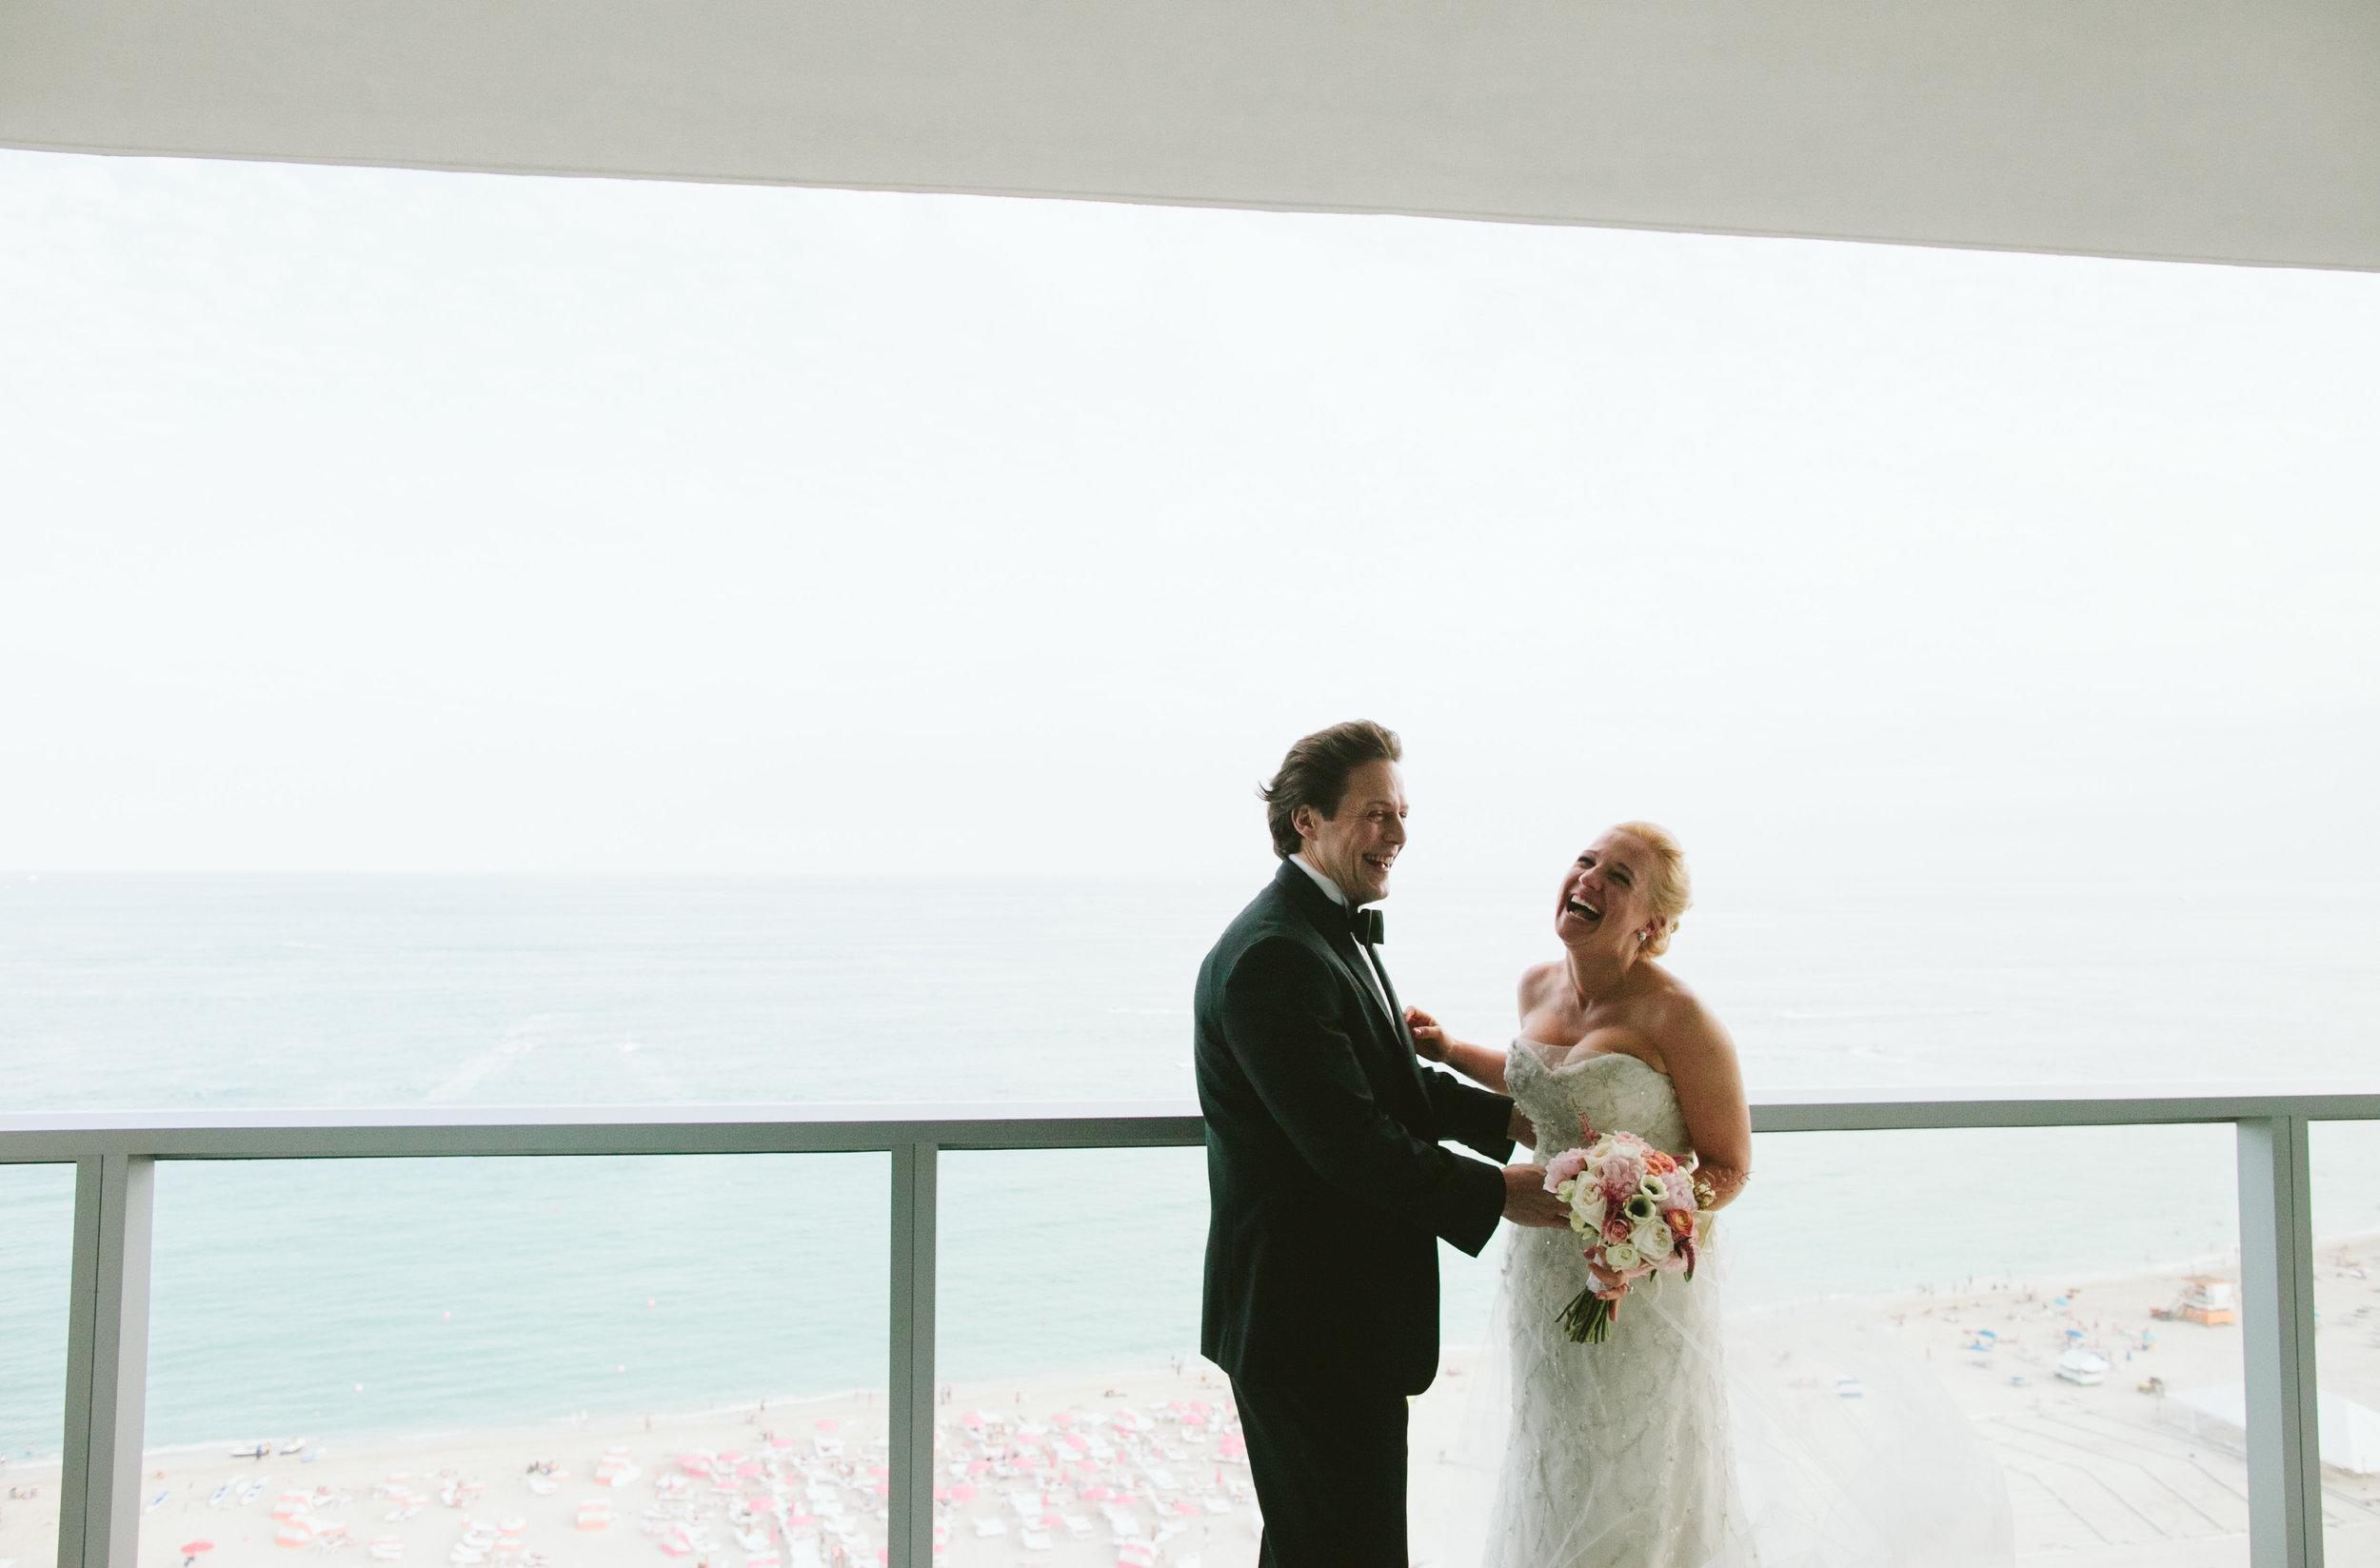 Jackie + Joe Wedding at the W South Beach Miami36.jpg